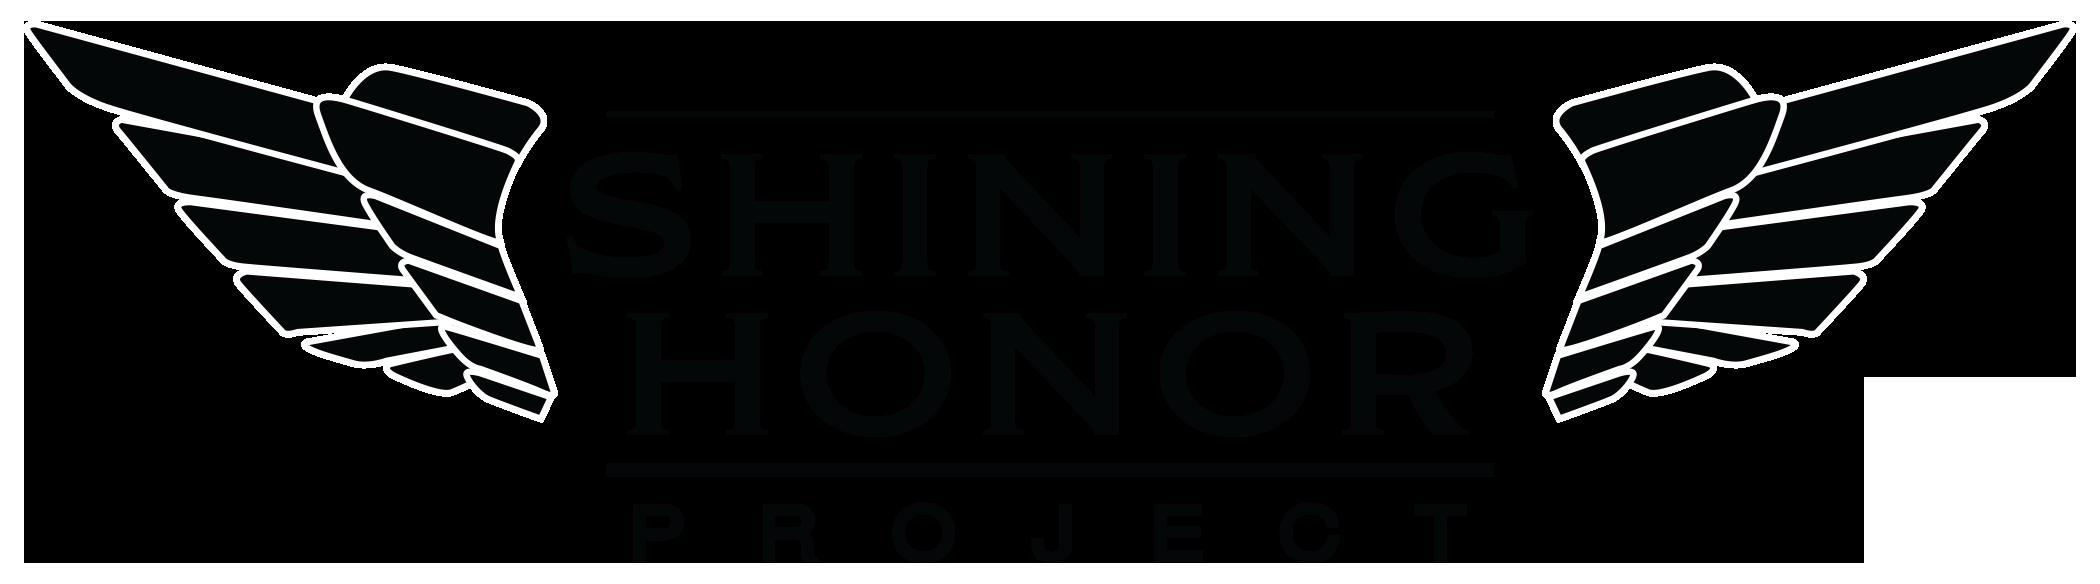 Shining Honor